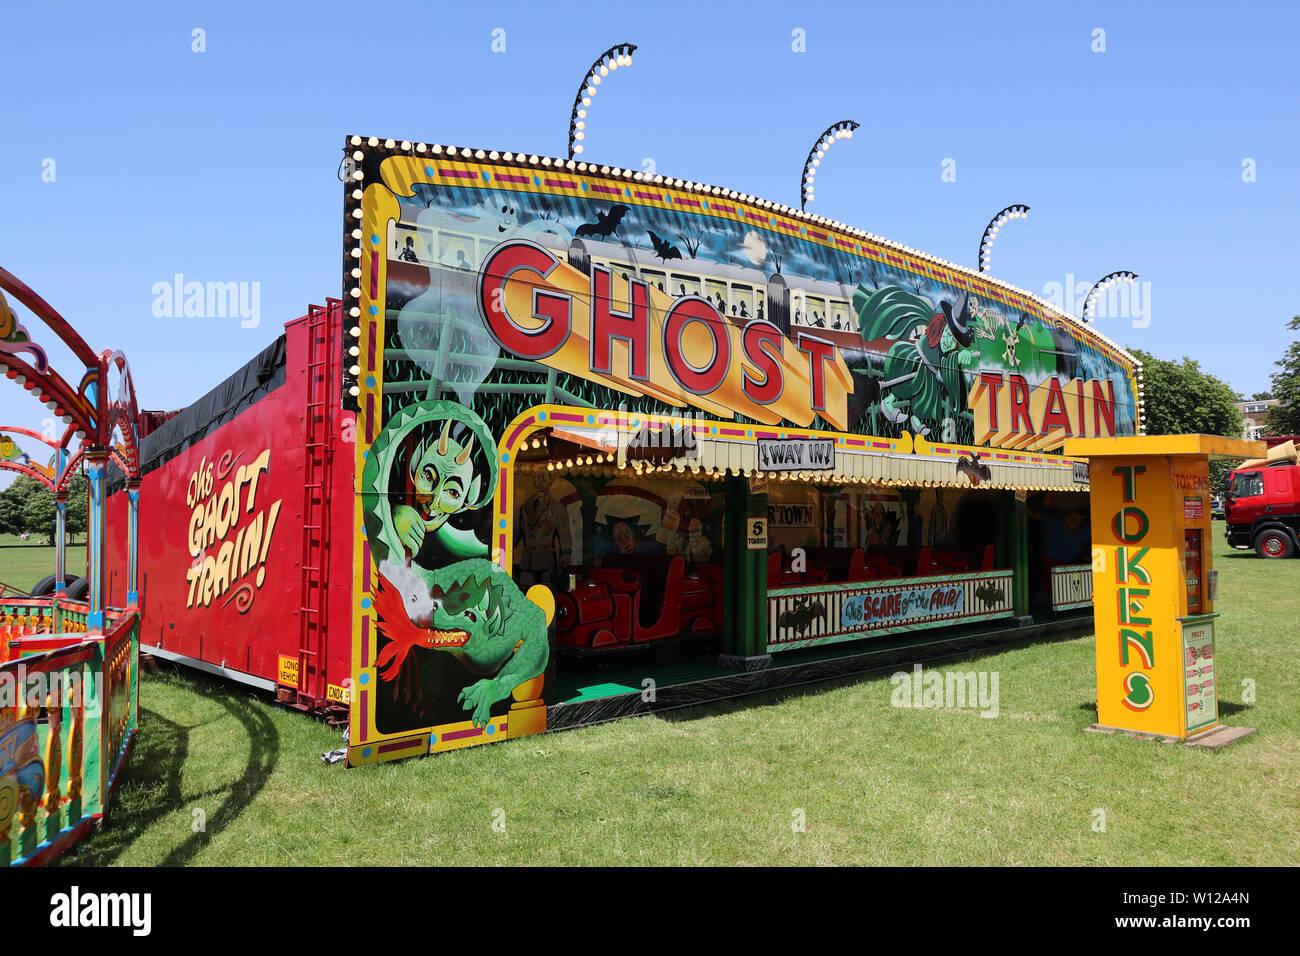 Ghost Train Carters Steam Fair Peckham Rye Common London Uk 29